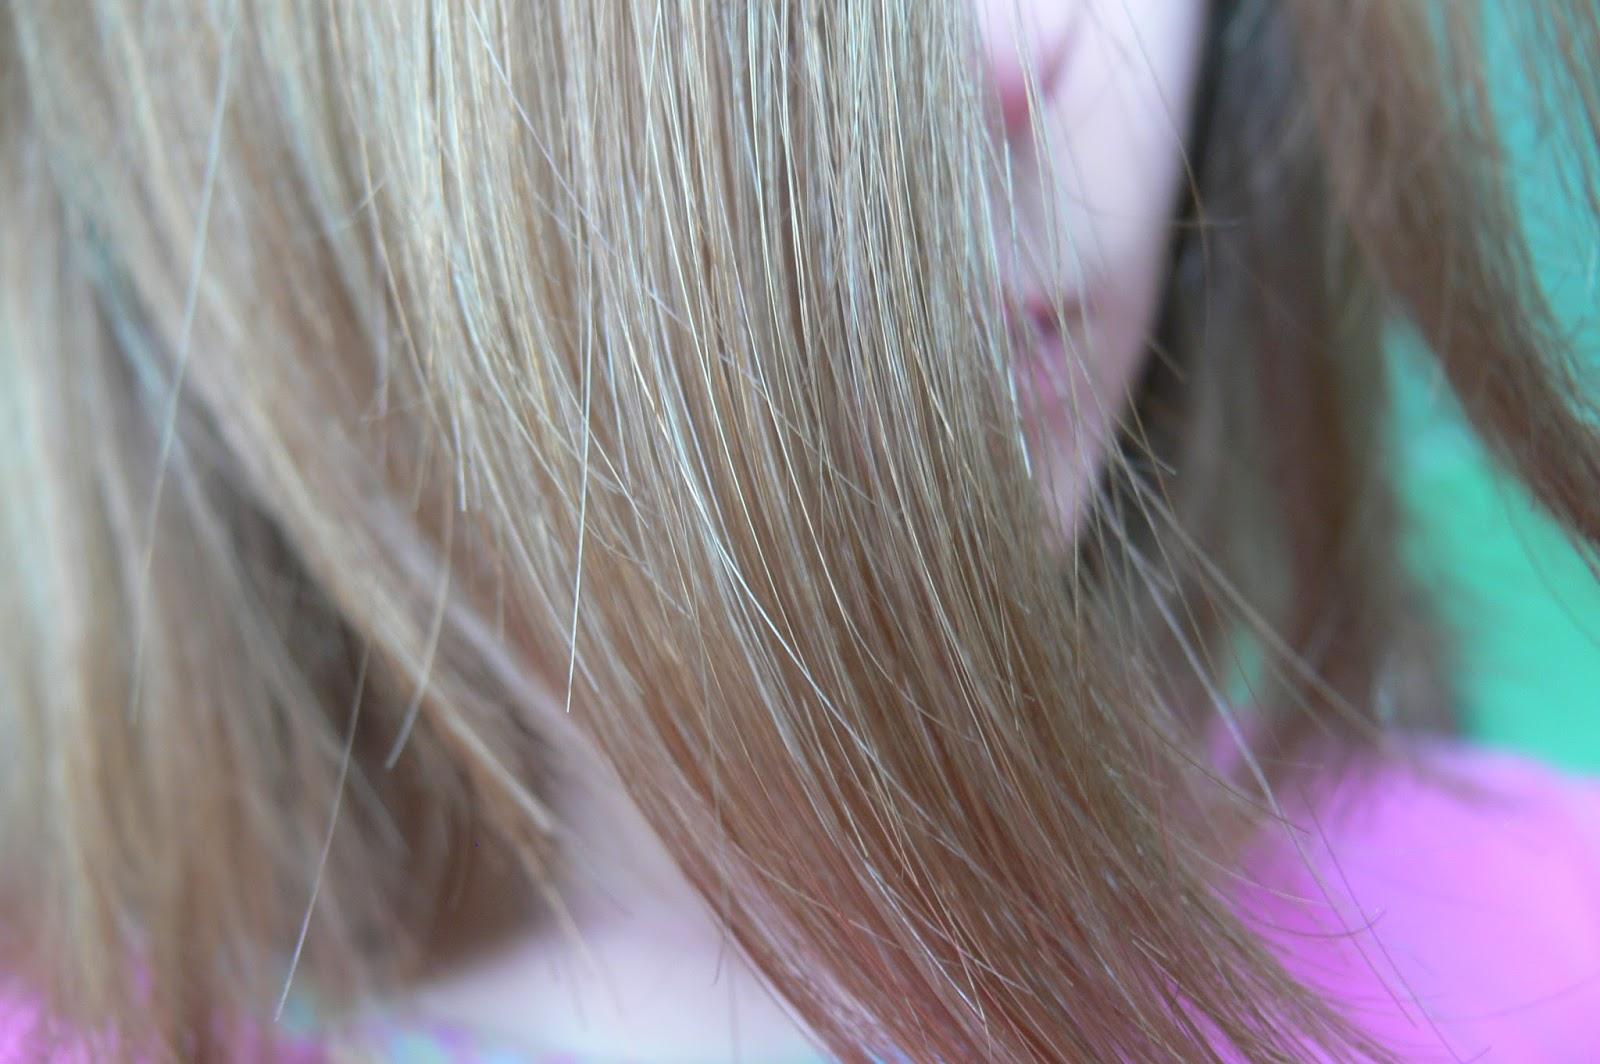 Avon Advance Techniques Średni Popielaty Blond 8.1 efekt po farbowaniu